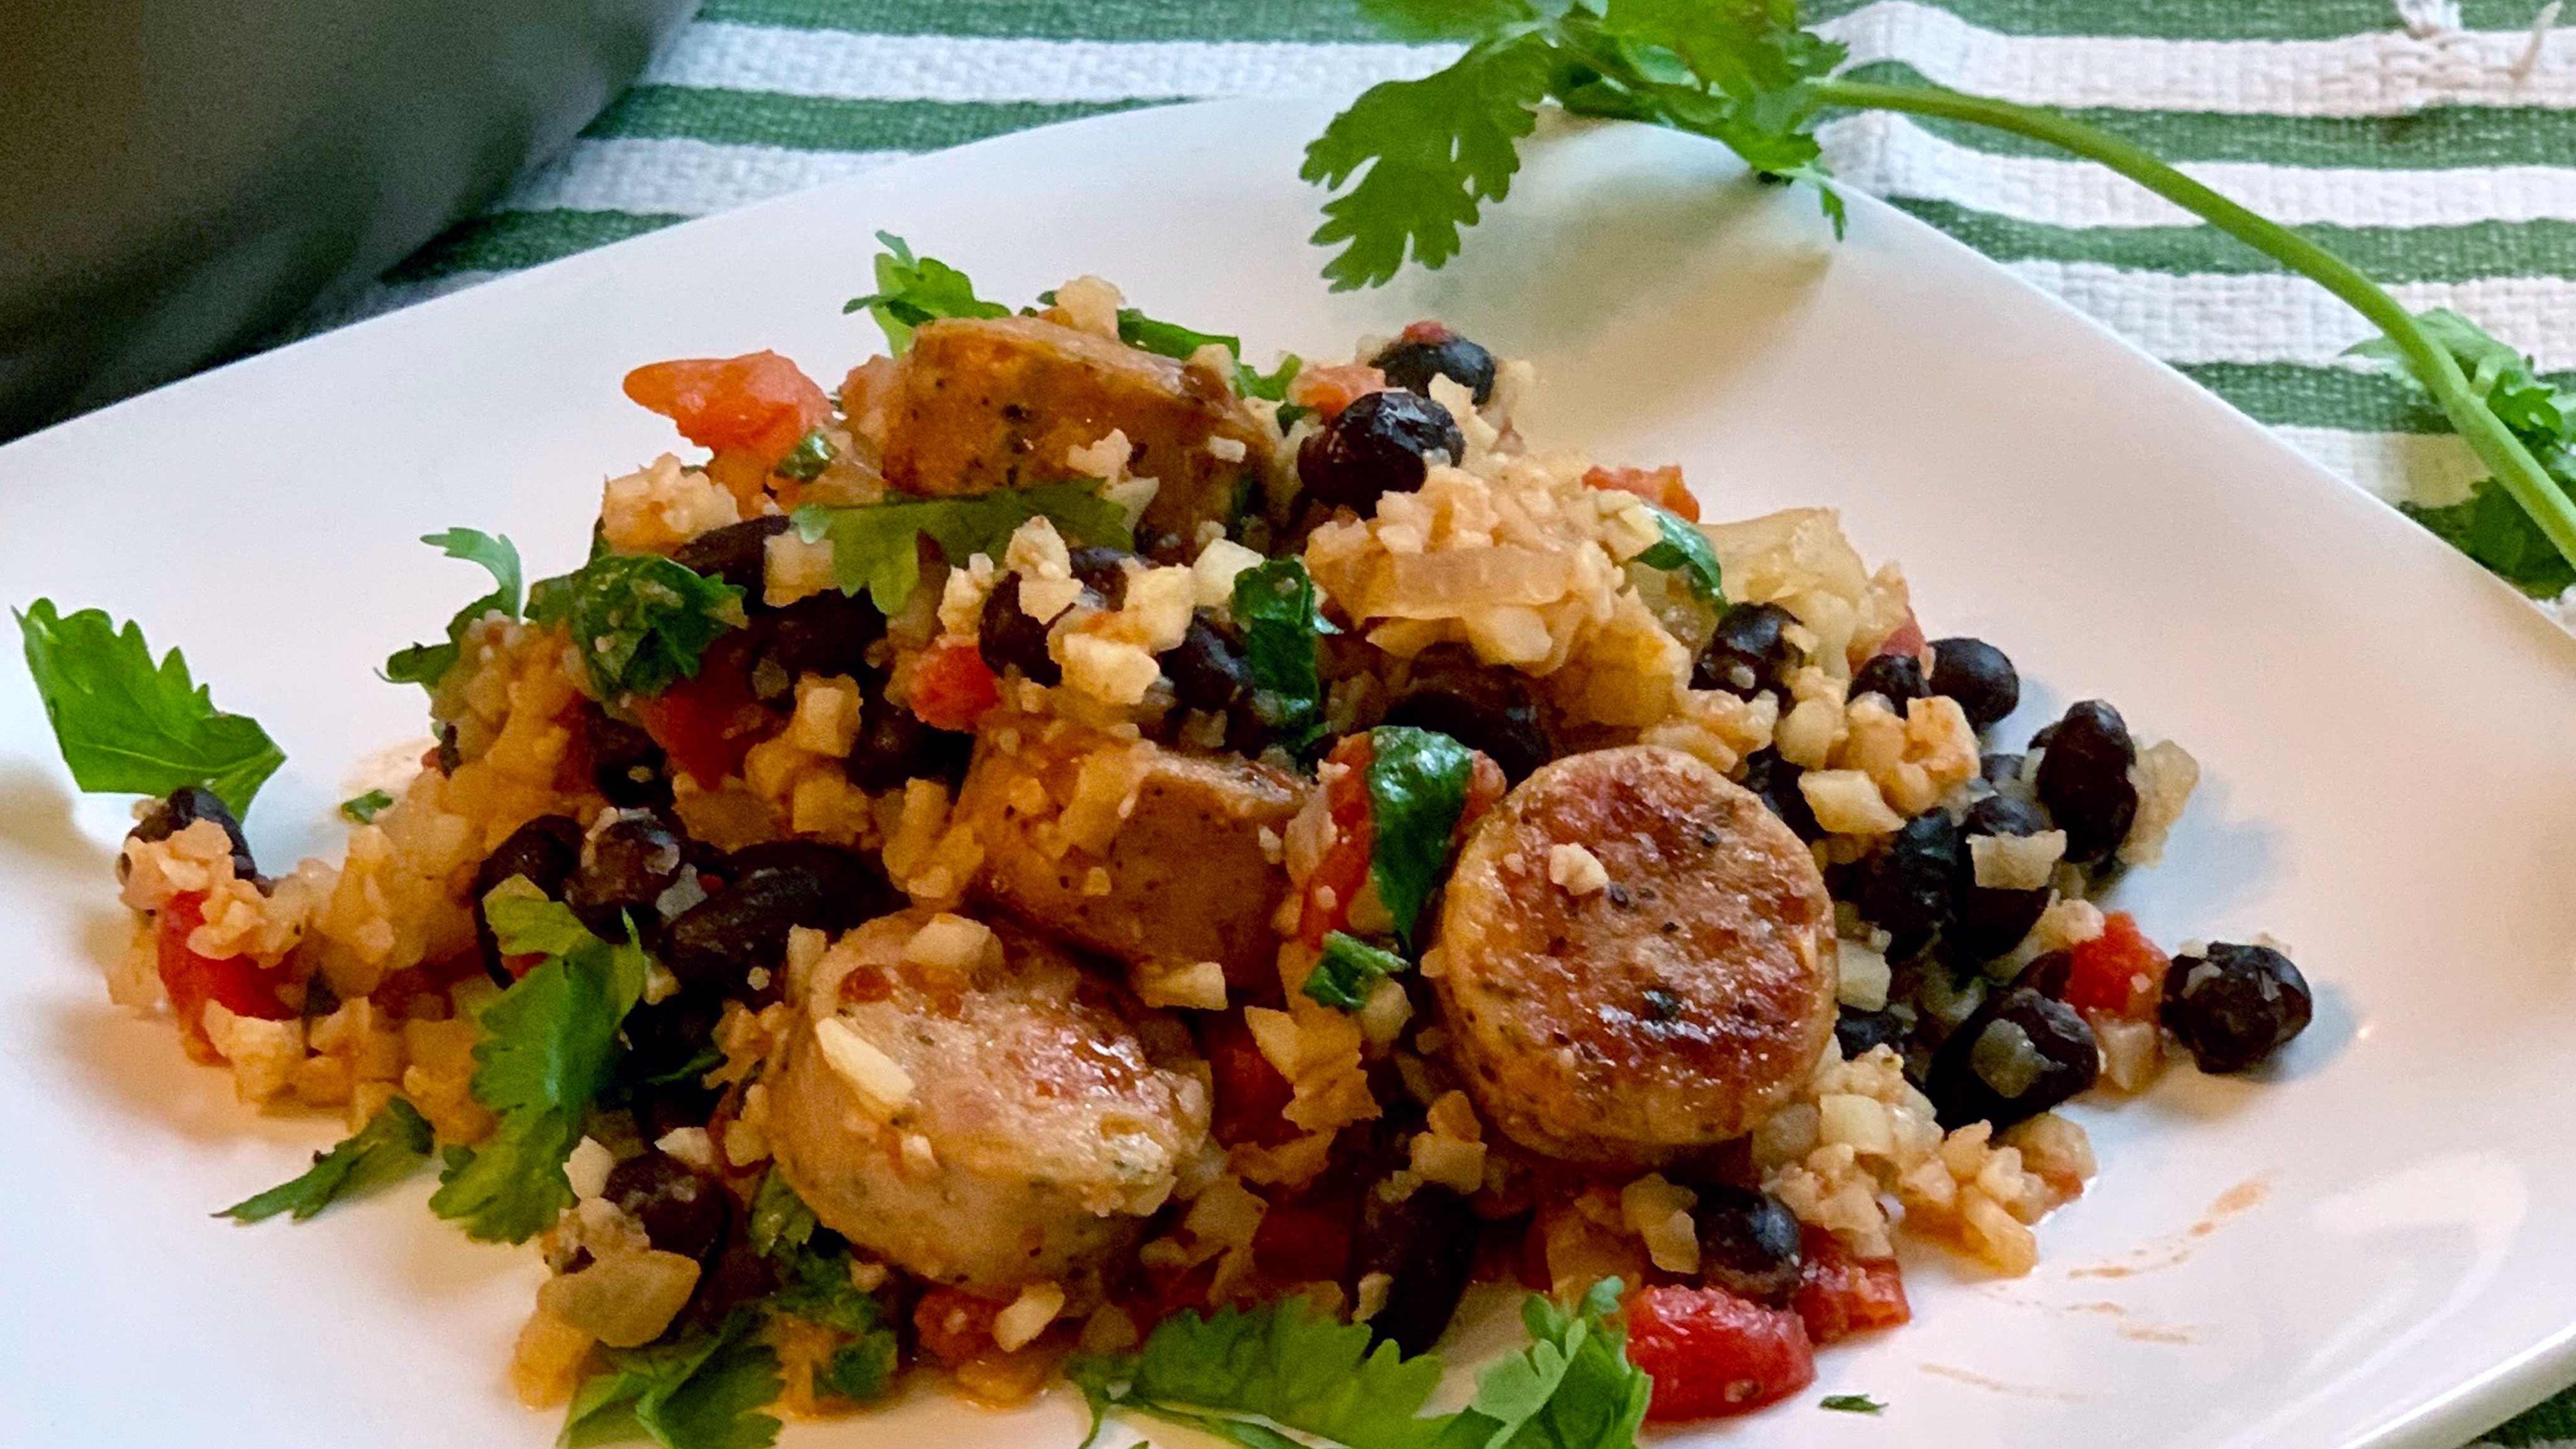 Image for Recipe Spanish Cauliflower Rice, Sausage and Beans